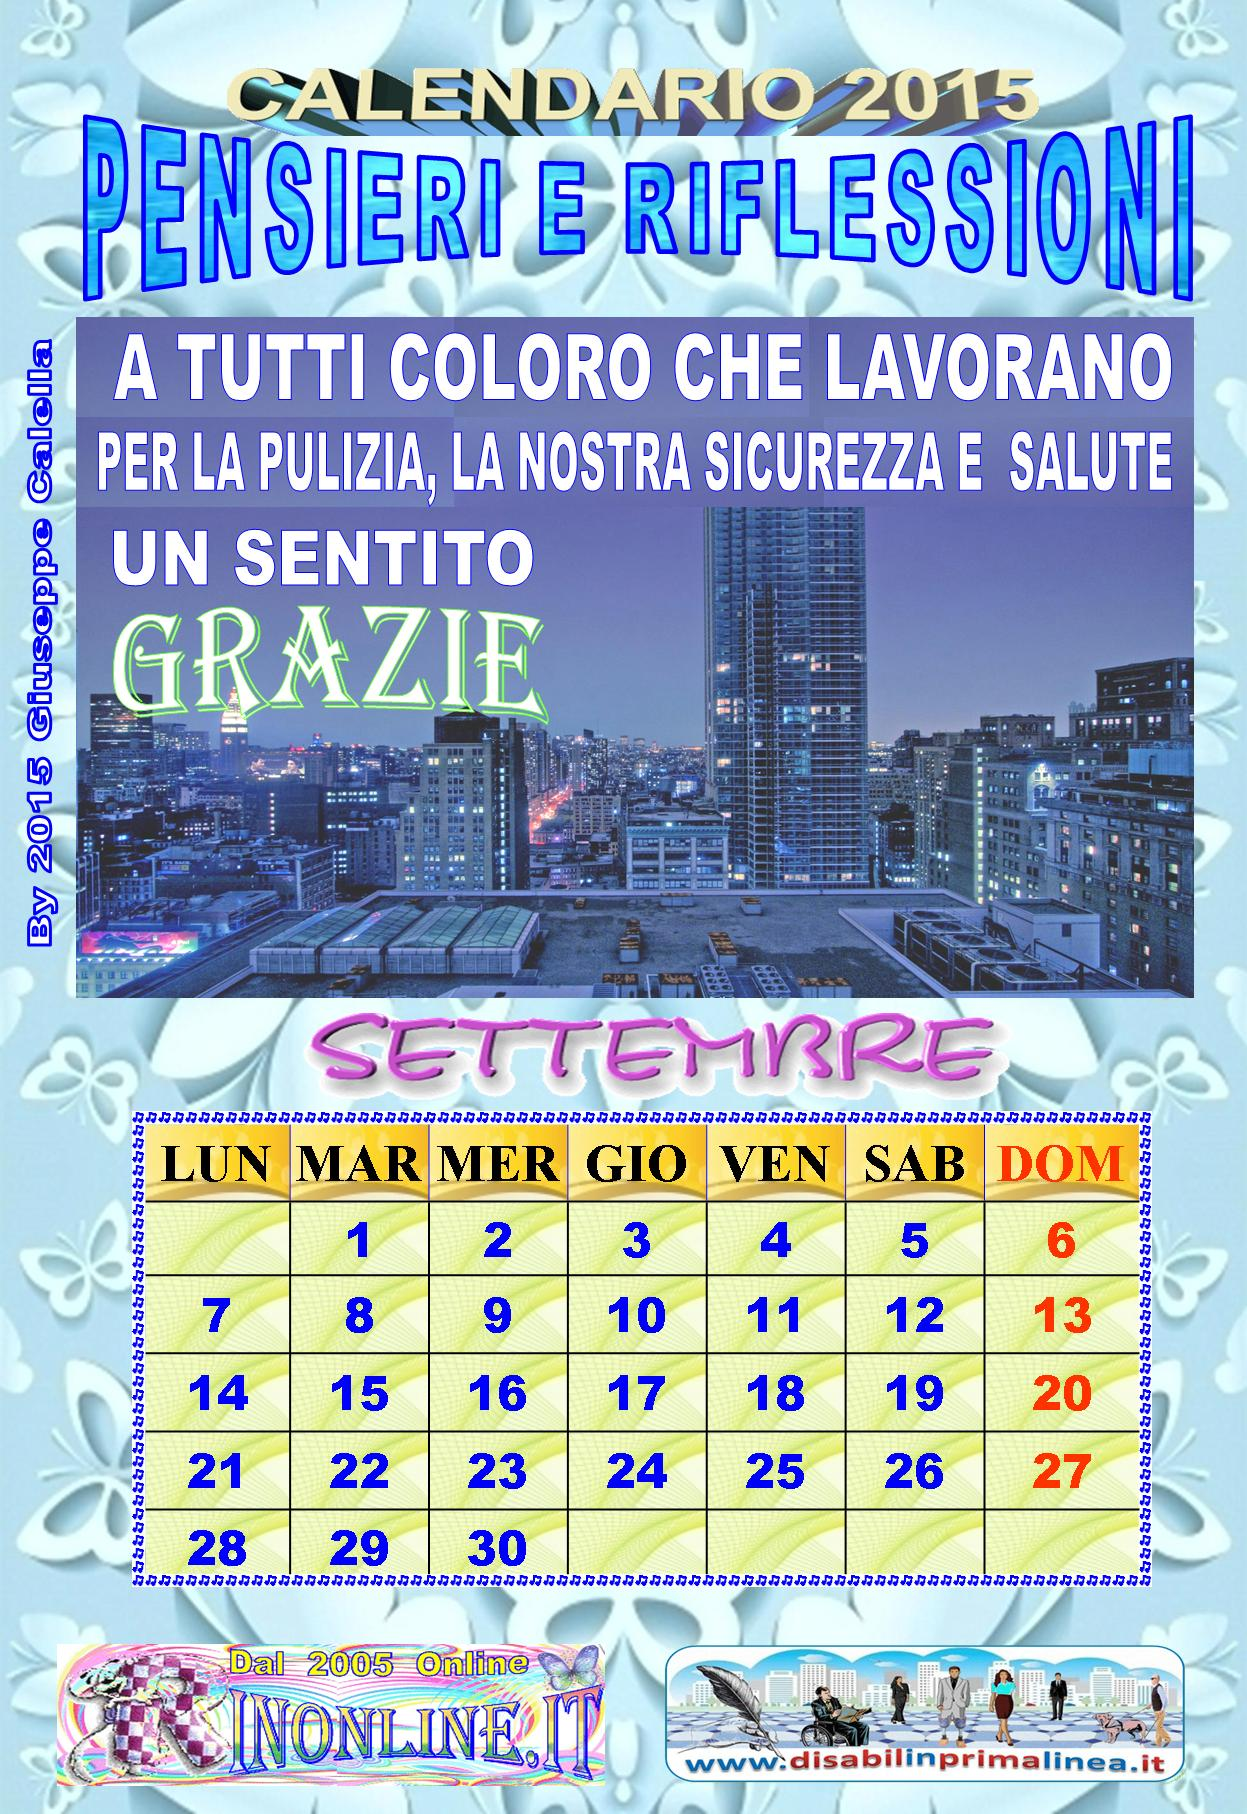 settembre_calendario_2015_pensieri_riflessioni_giuseppe_calella